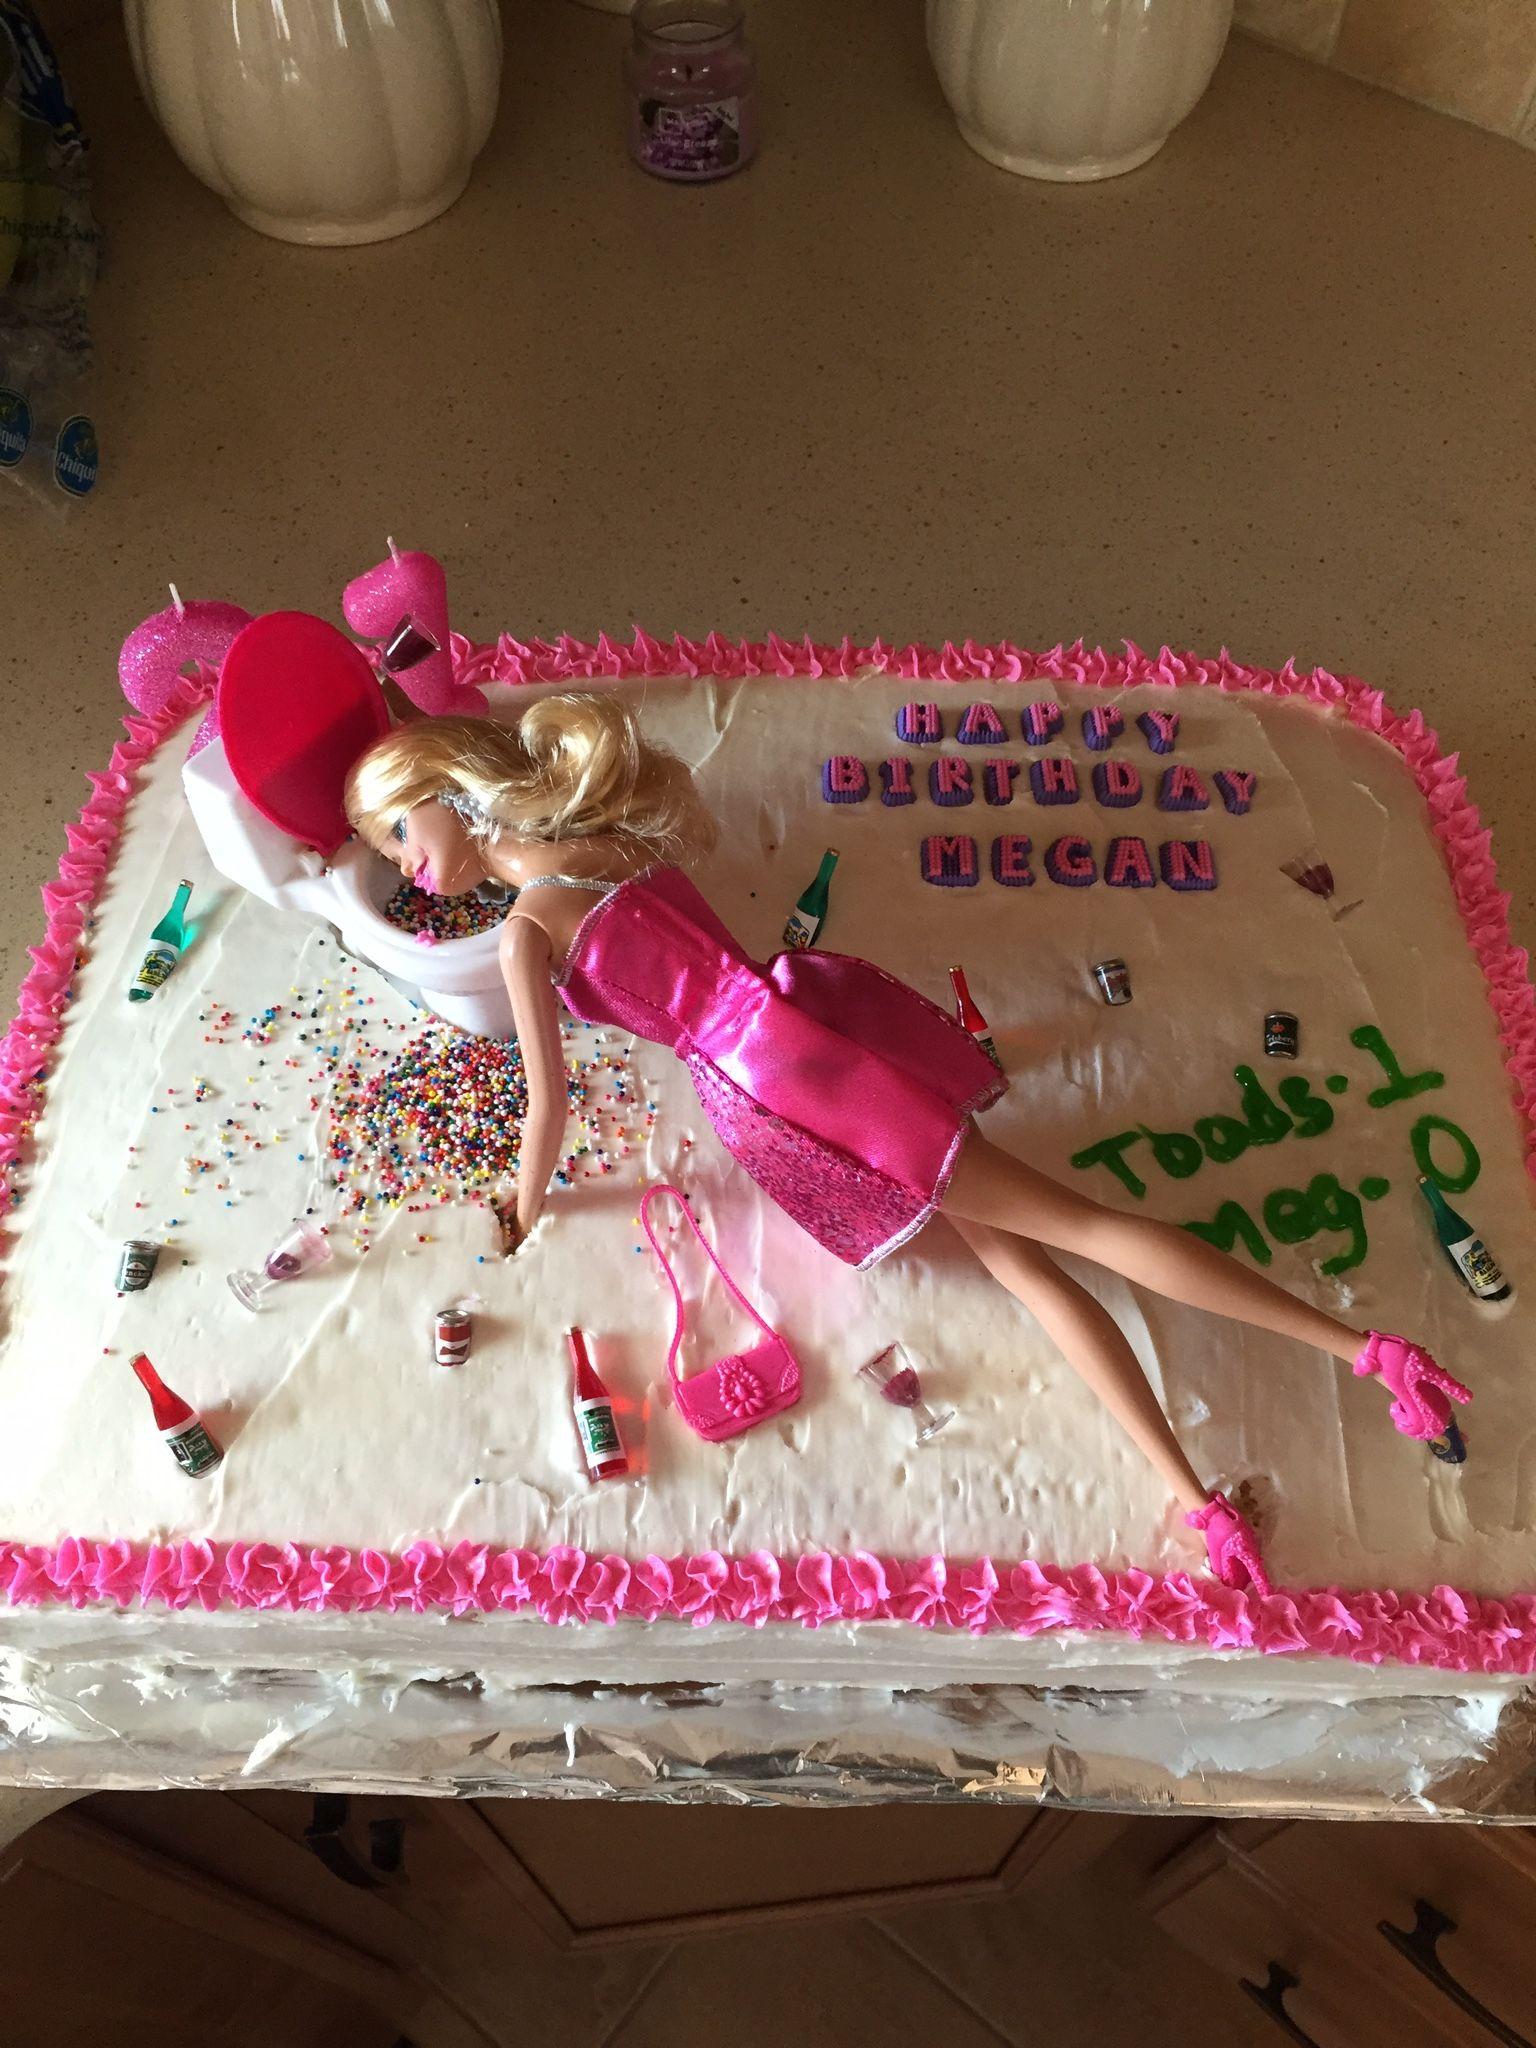 21st birthday | 21st birthday, Birthday candles, Birthday